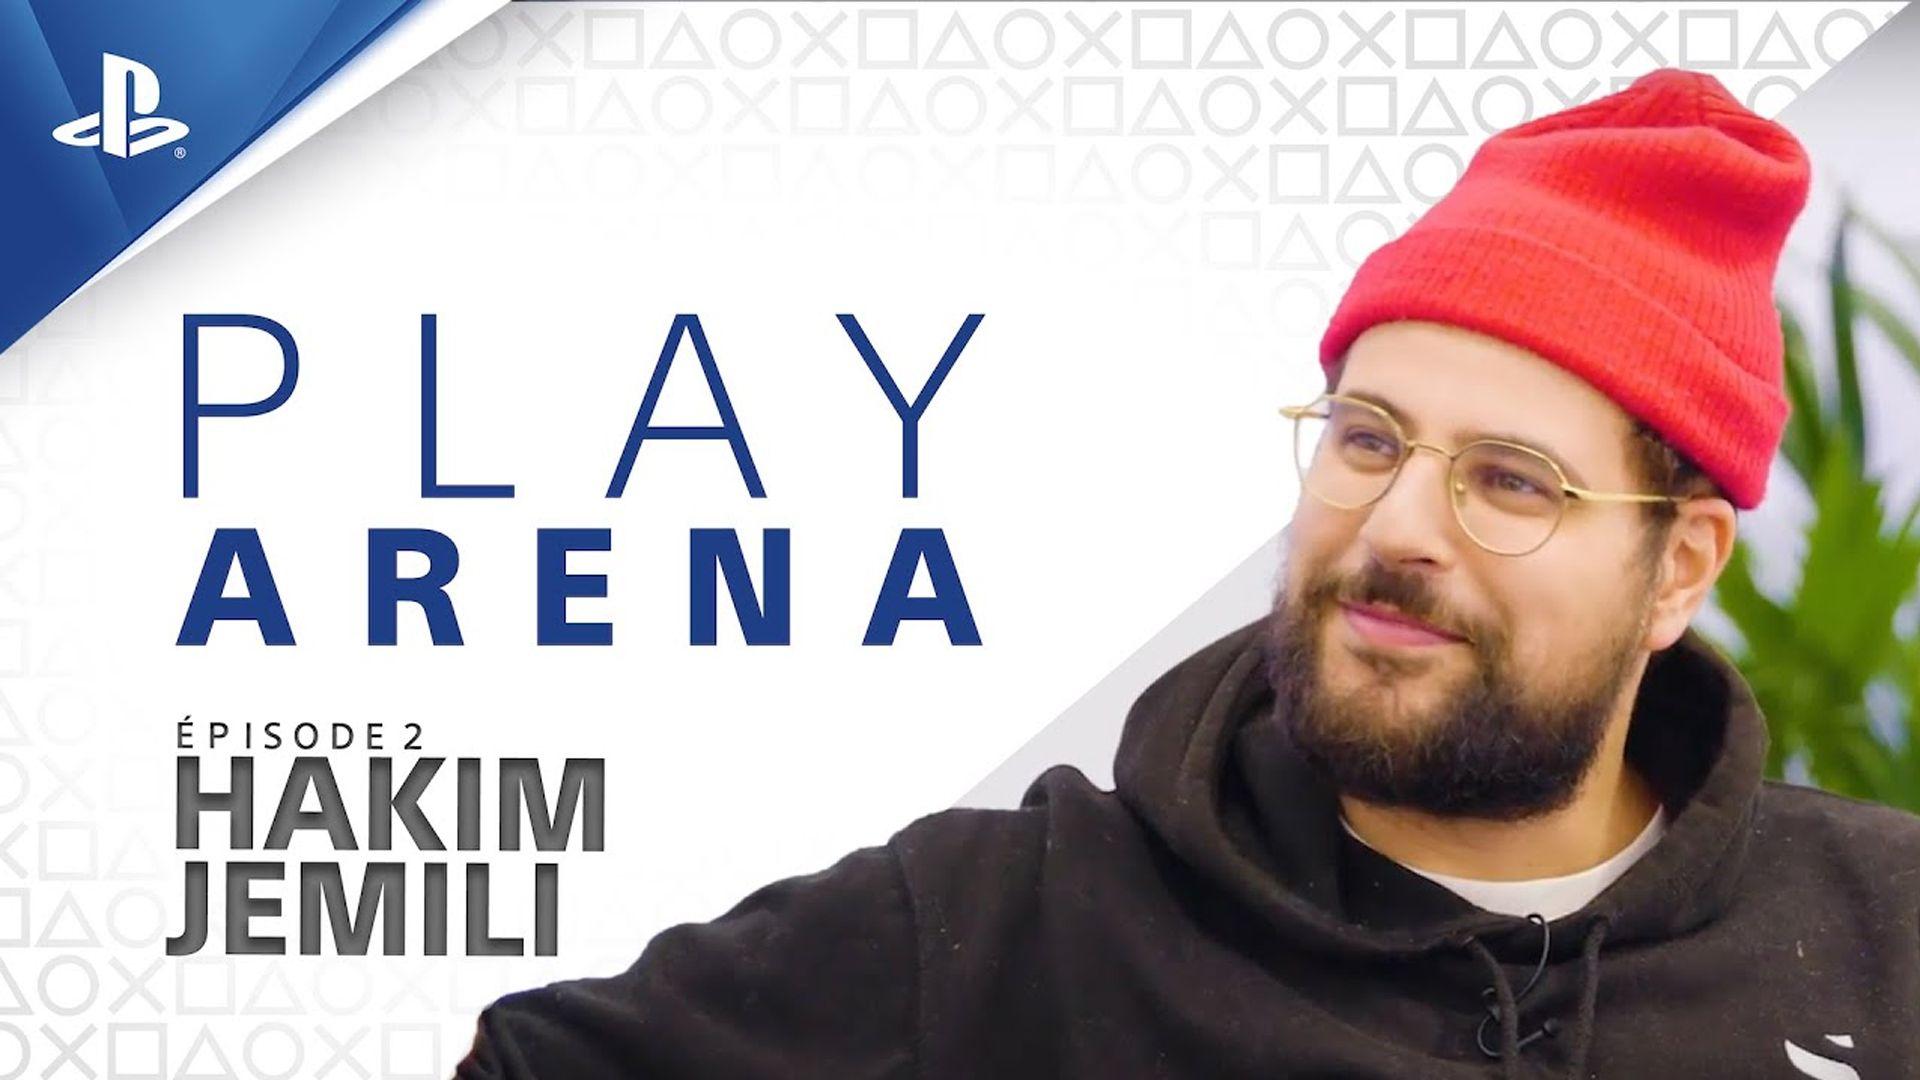 Play Arena 2 : Hakim Jemili et Demon's Souls